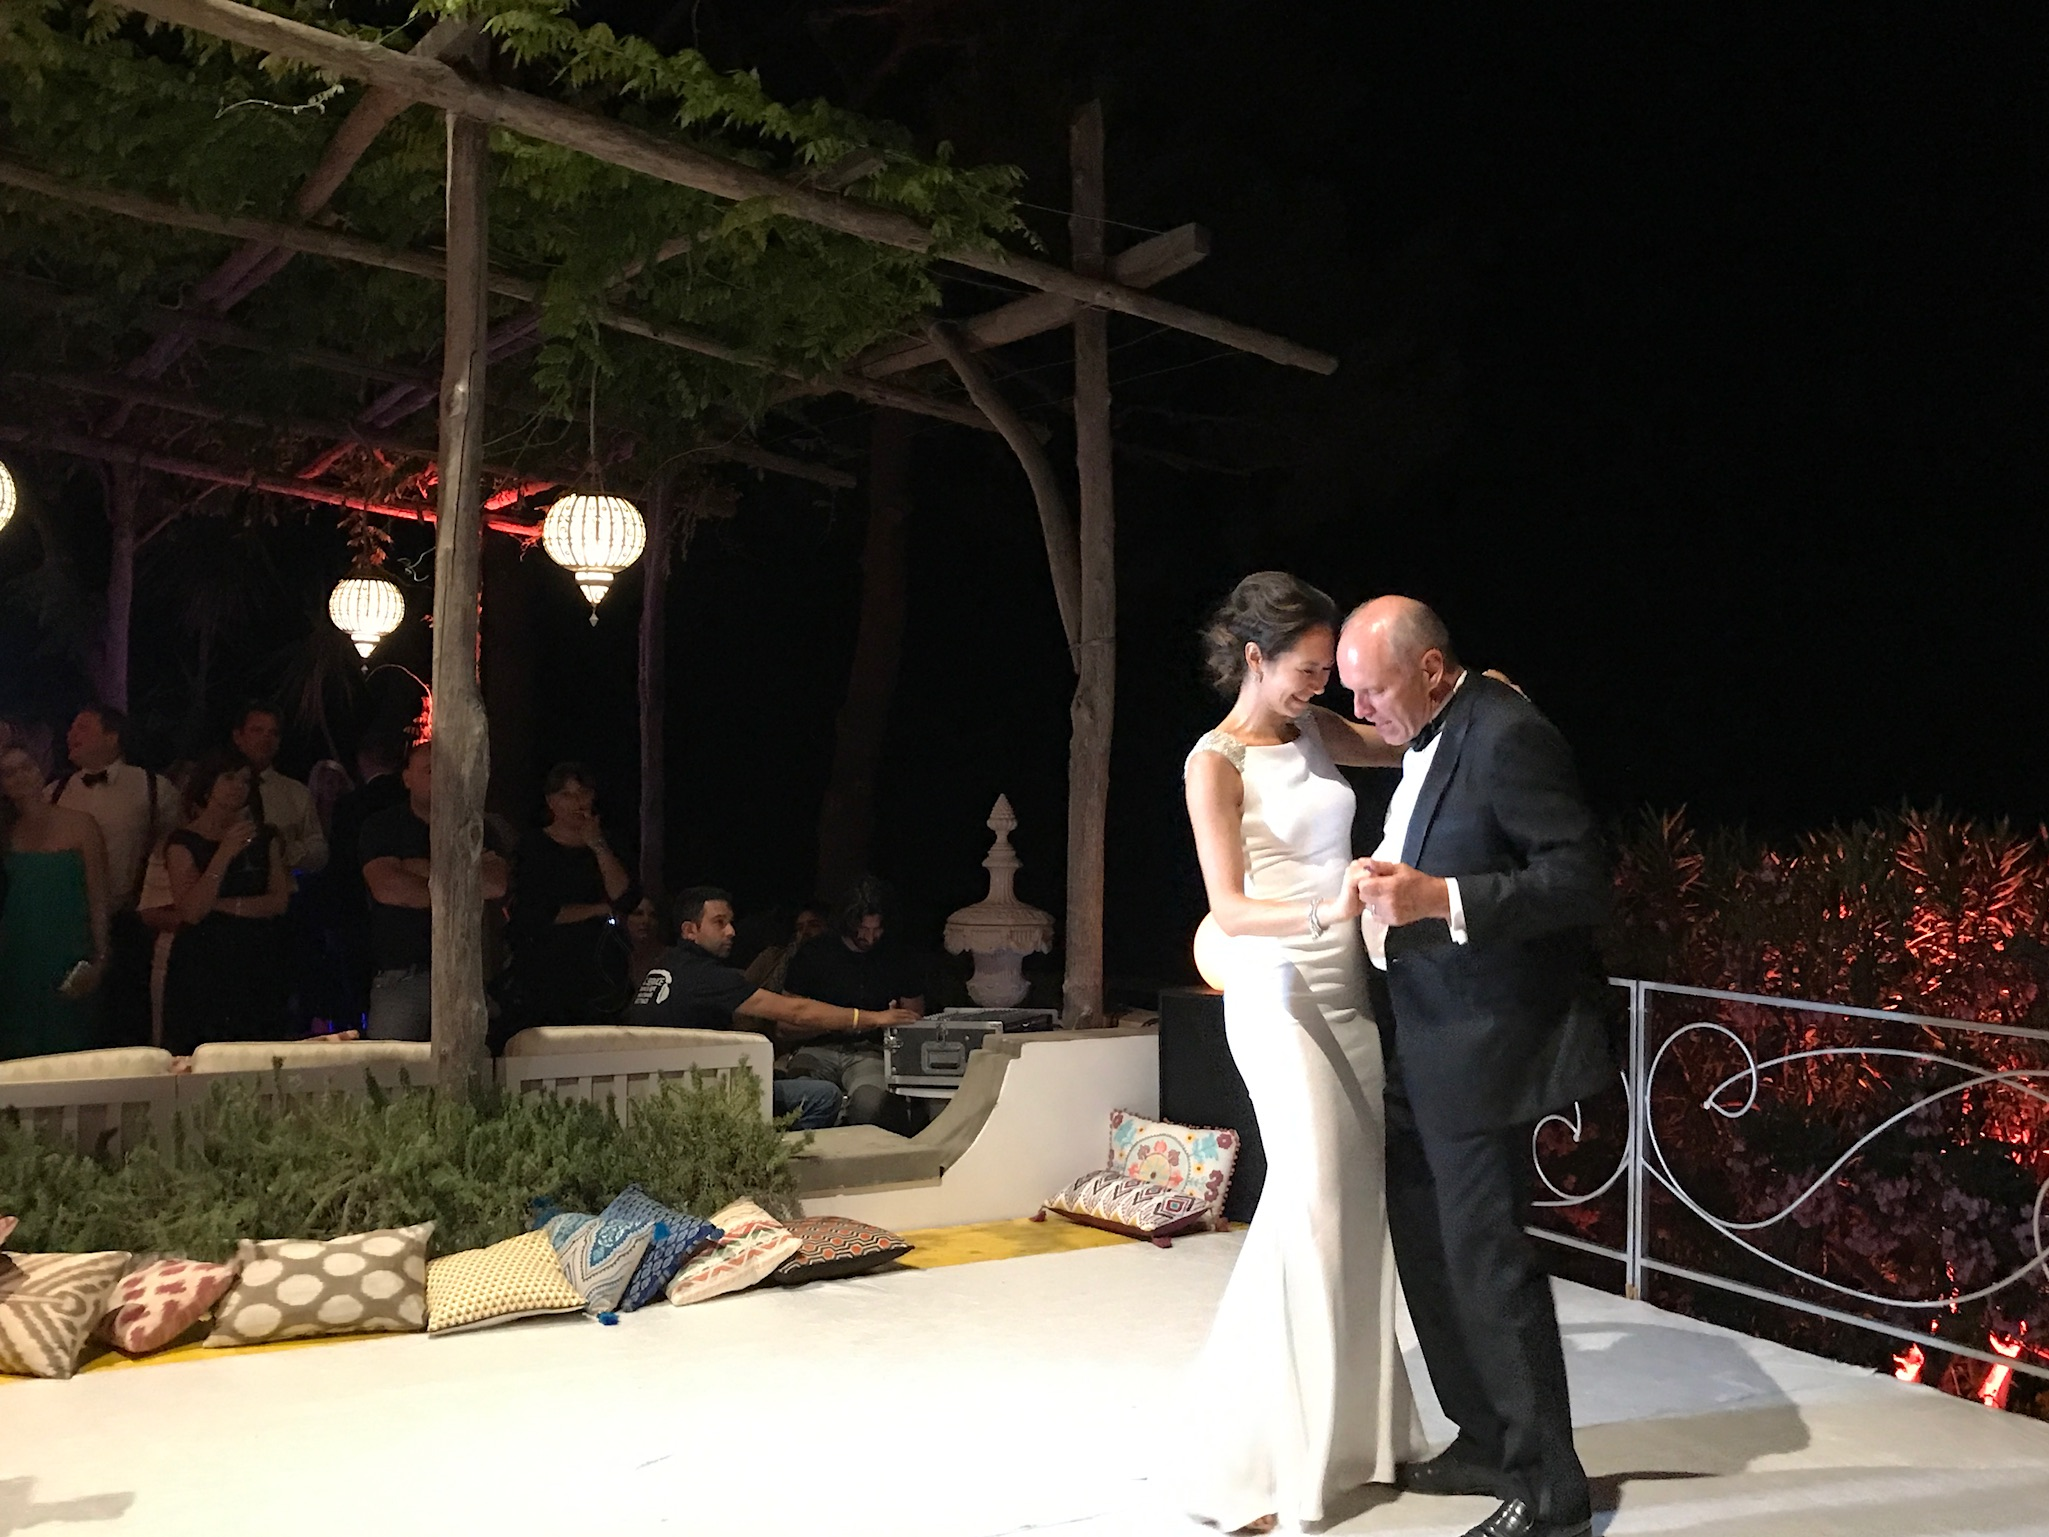 http://www.weddingamalfi.com/wp-content/uploads/Nathalie-and-Benjamin-wedding-in-Positano-26.jpg